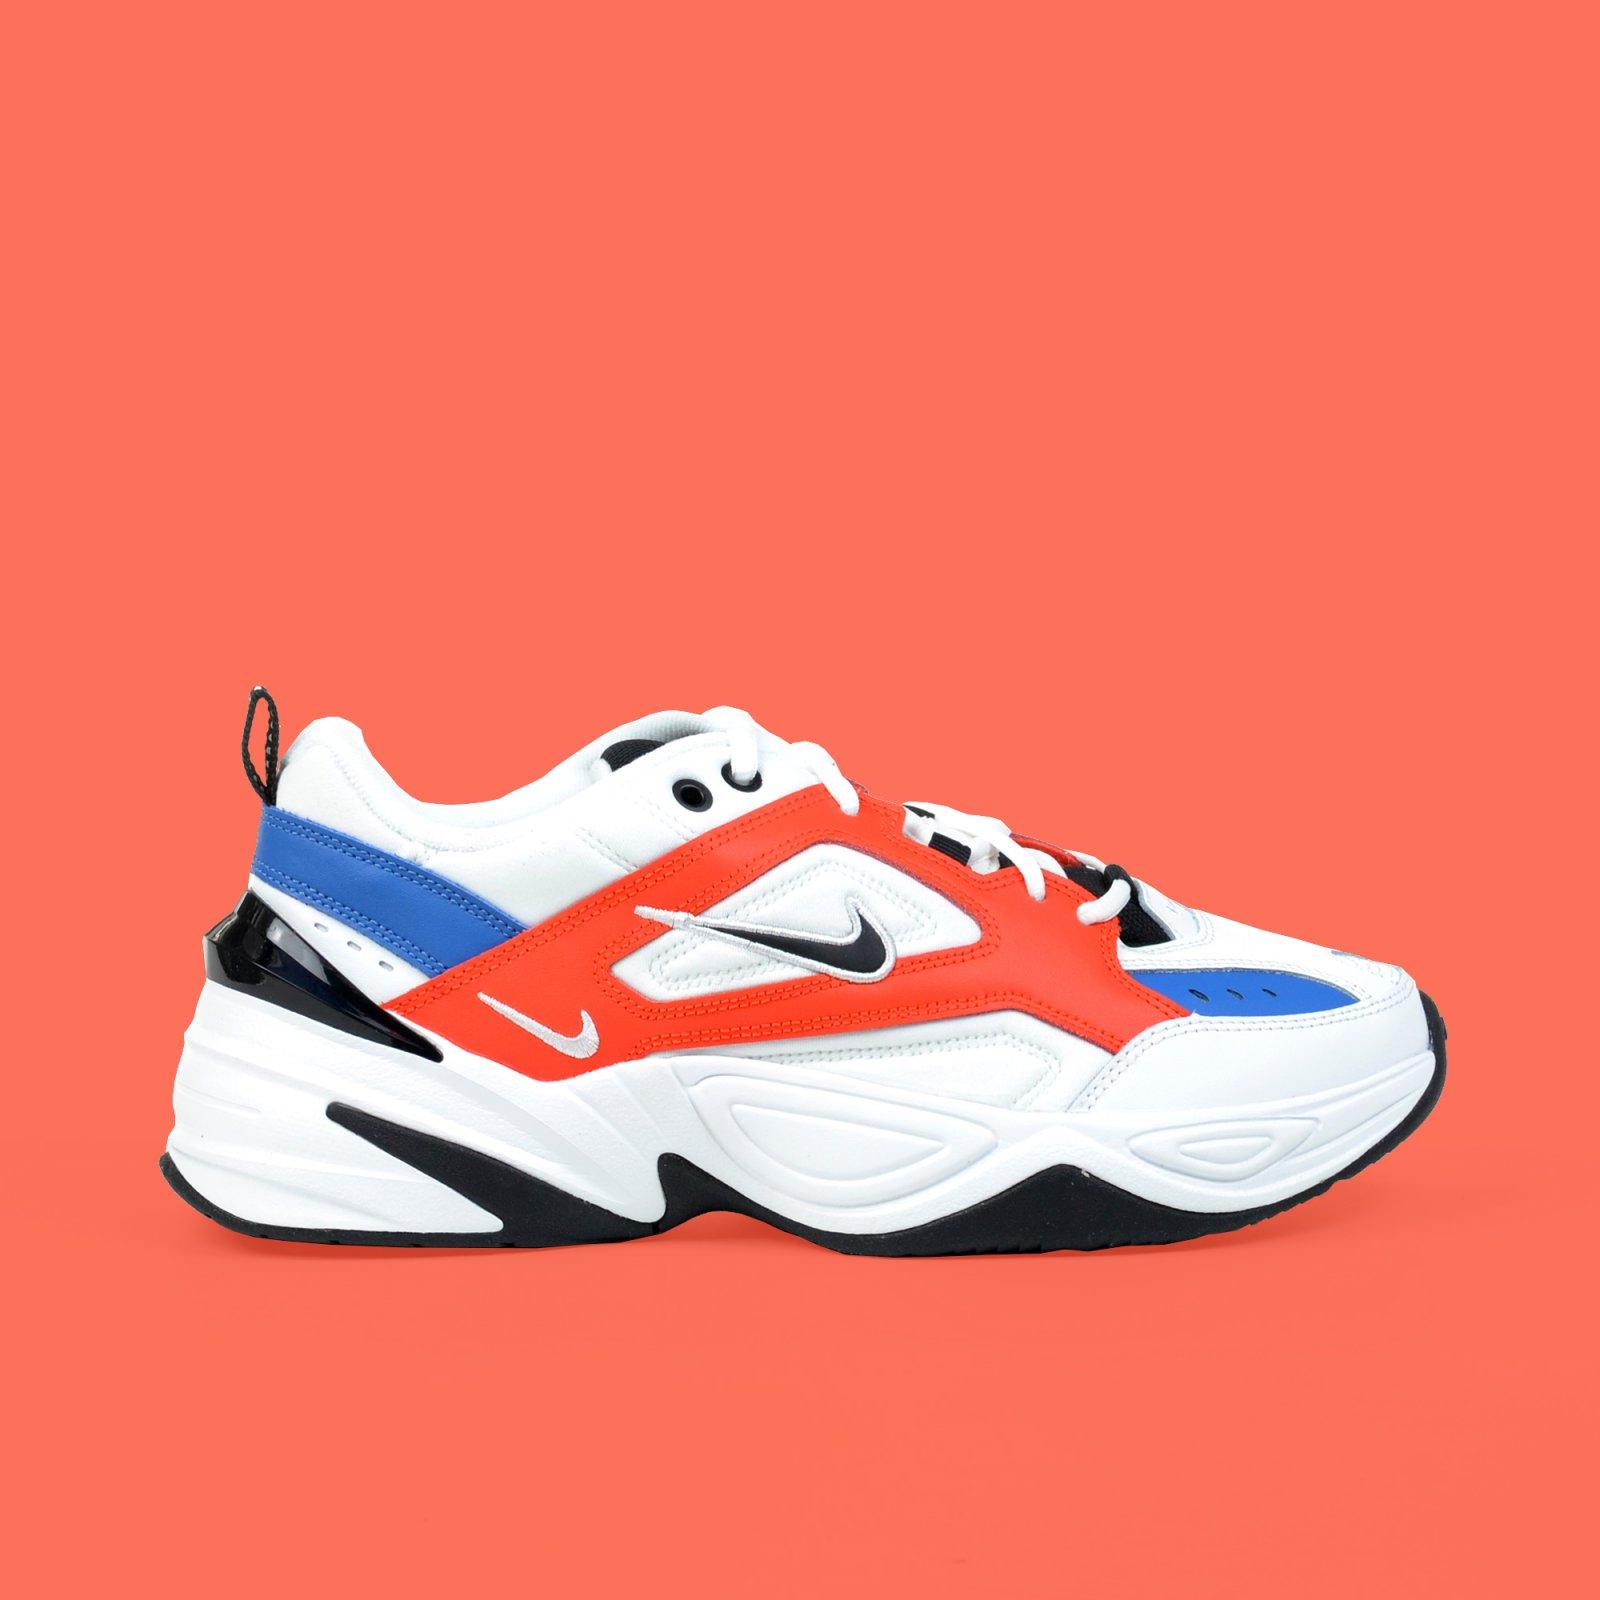 Details about Nike M2K Tekno John Elliott Summit White Black Orange Men\u0027s  Dad Shoes AV4789,100